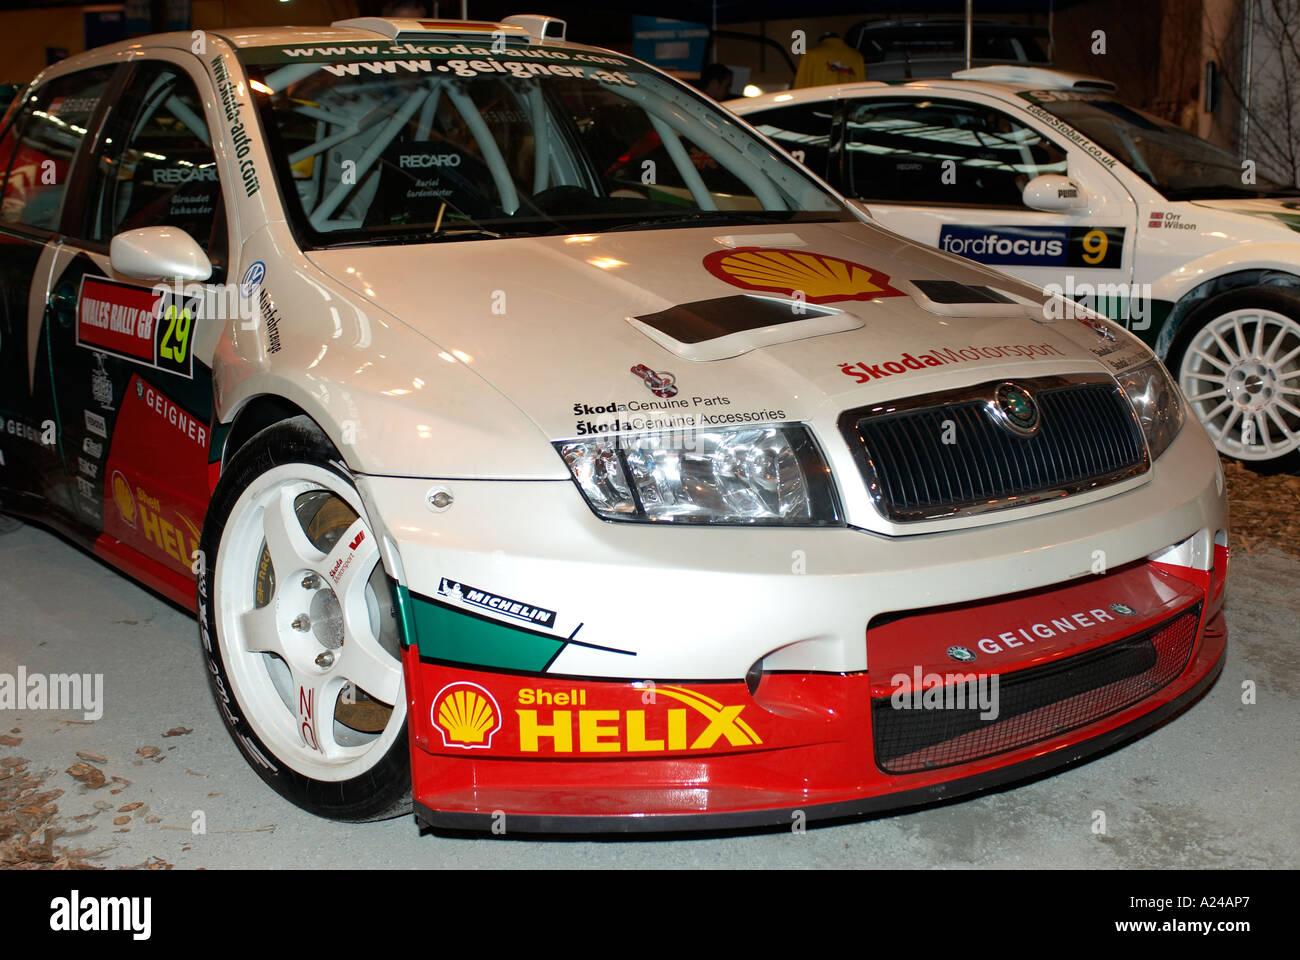 Skoda WRC World Rally Car pictured at the Autosport International ...